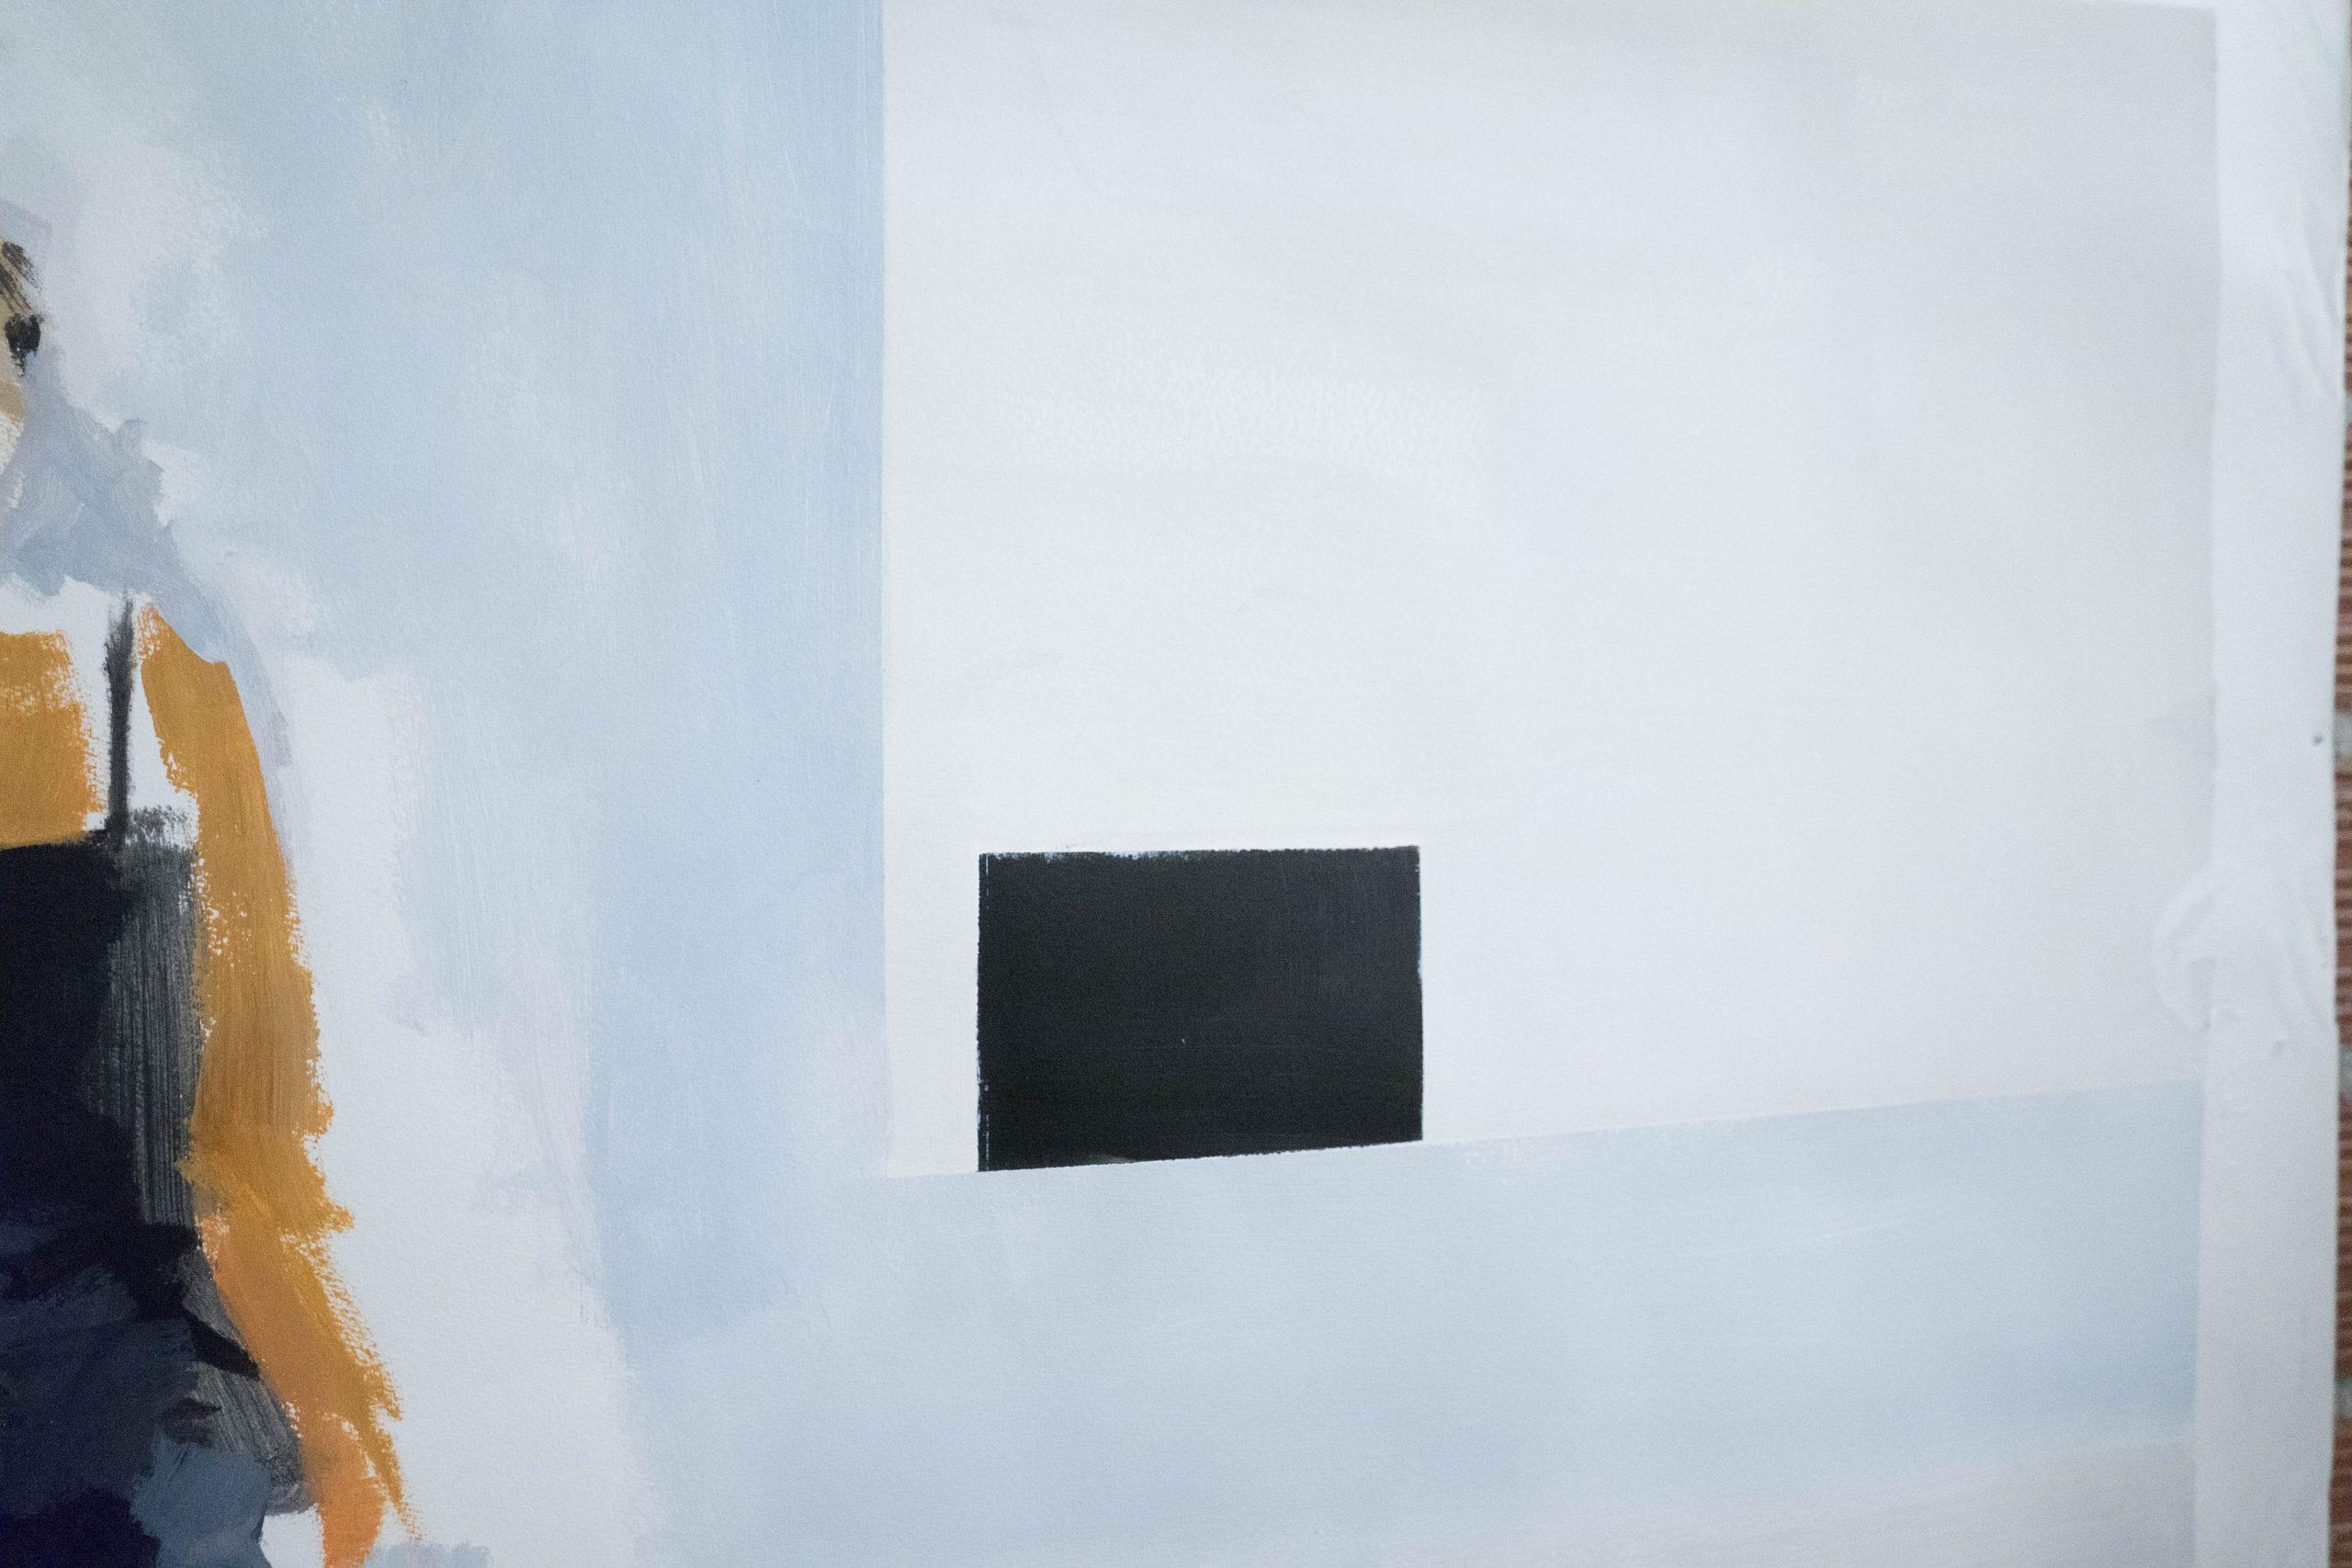 ventana acuarela color blanco lamina